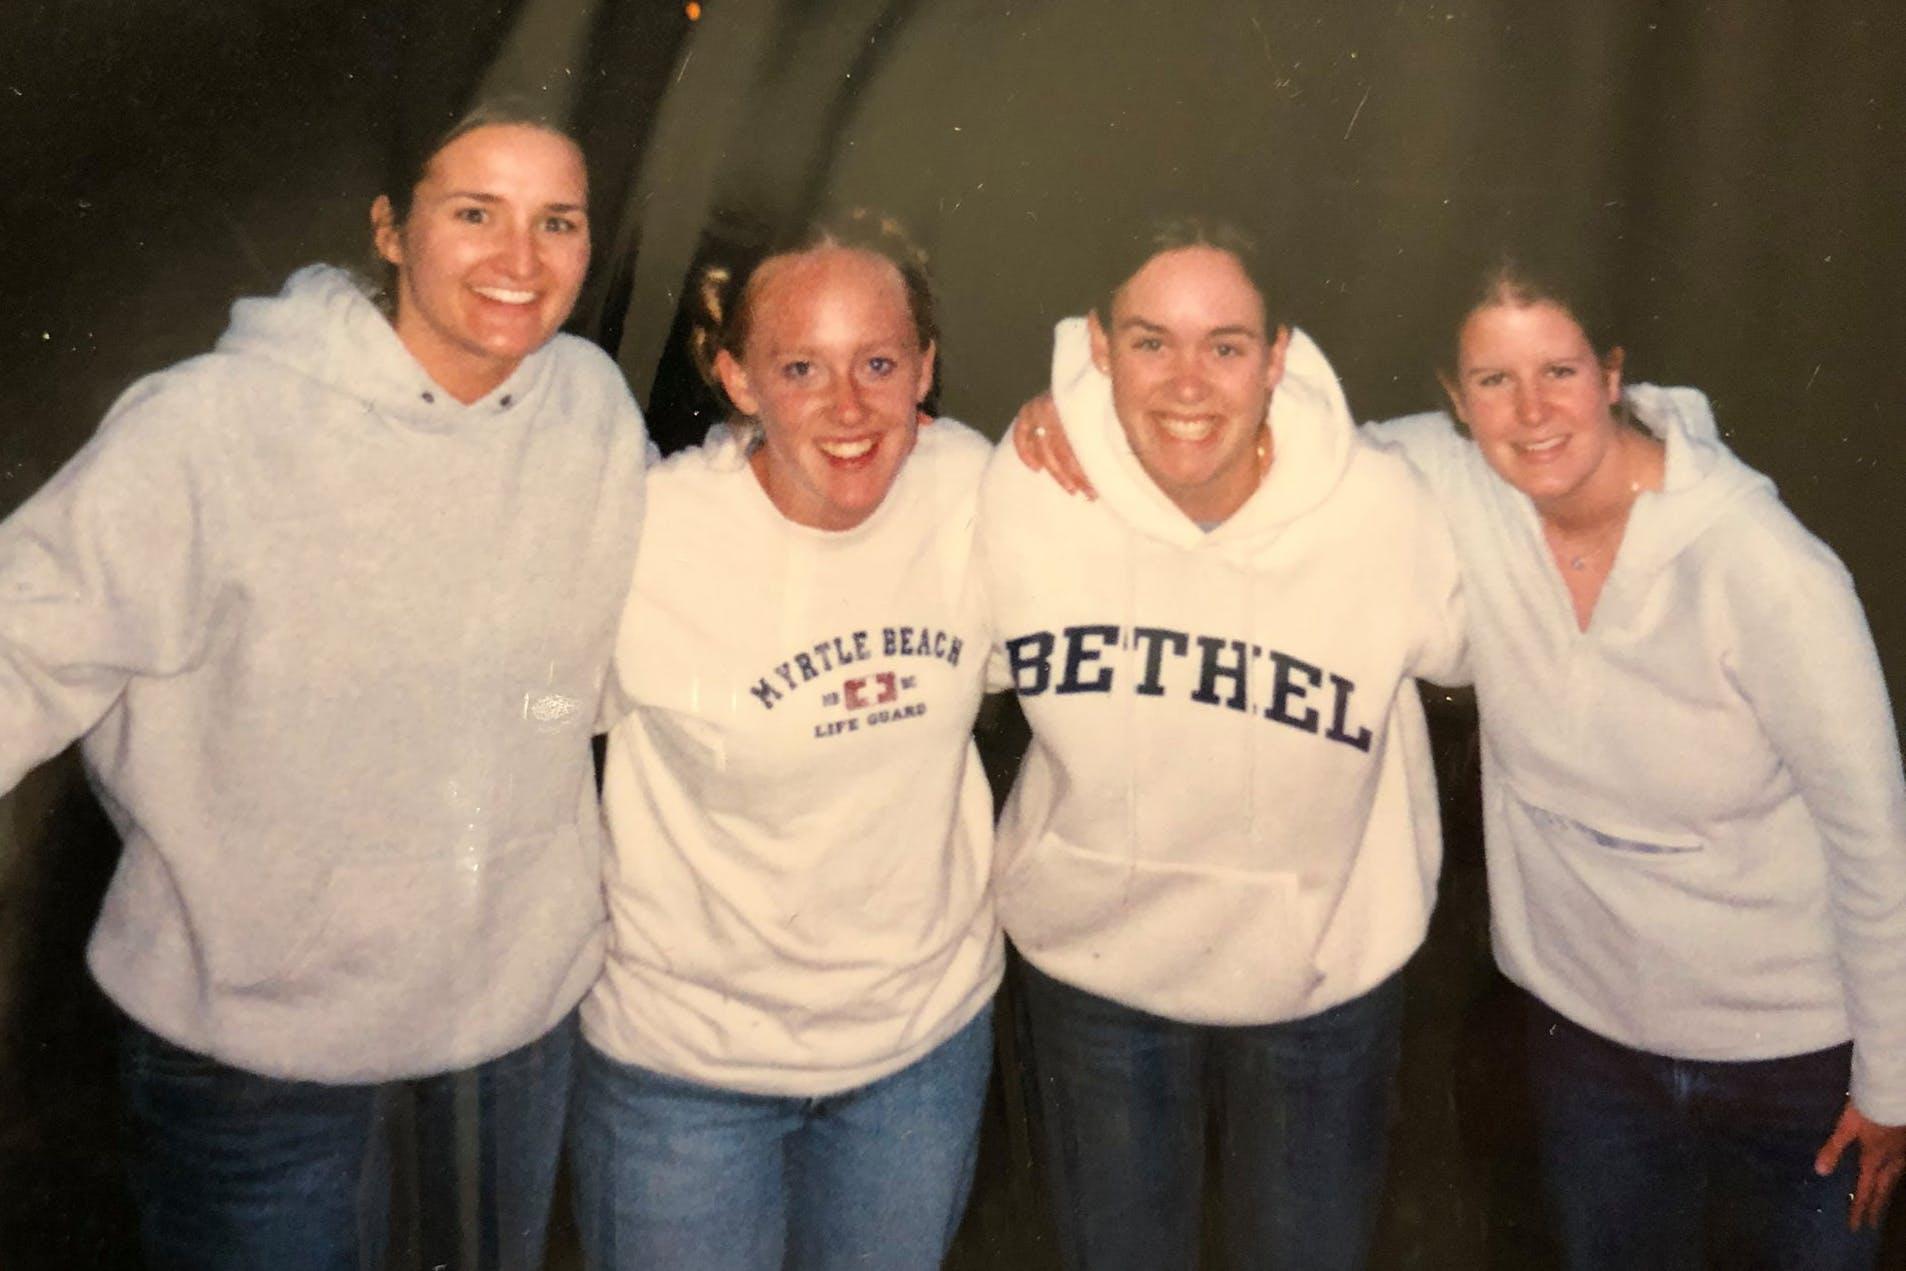 Kirsten (Frederick) Fumagalli '03 and friends at Bethel